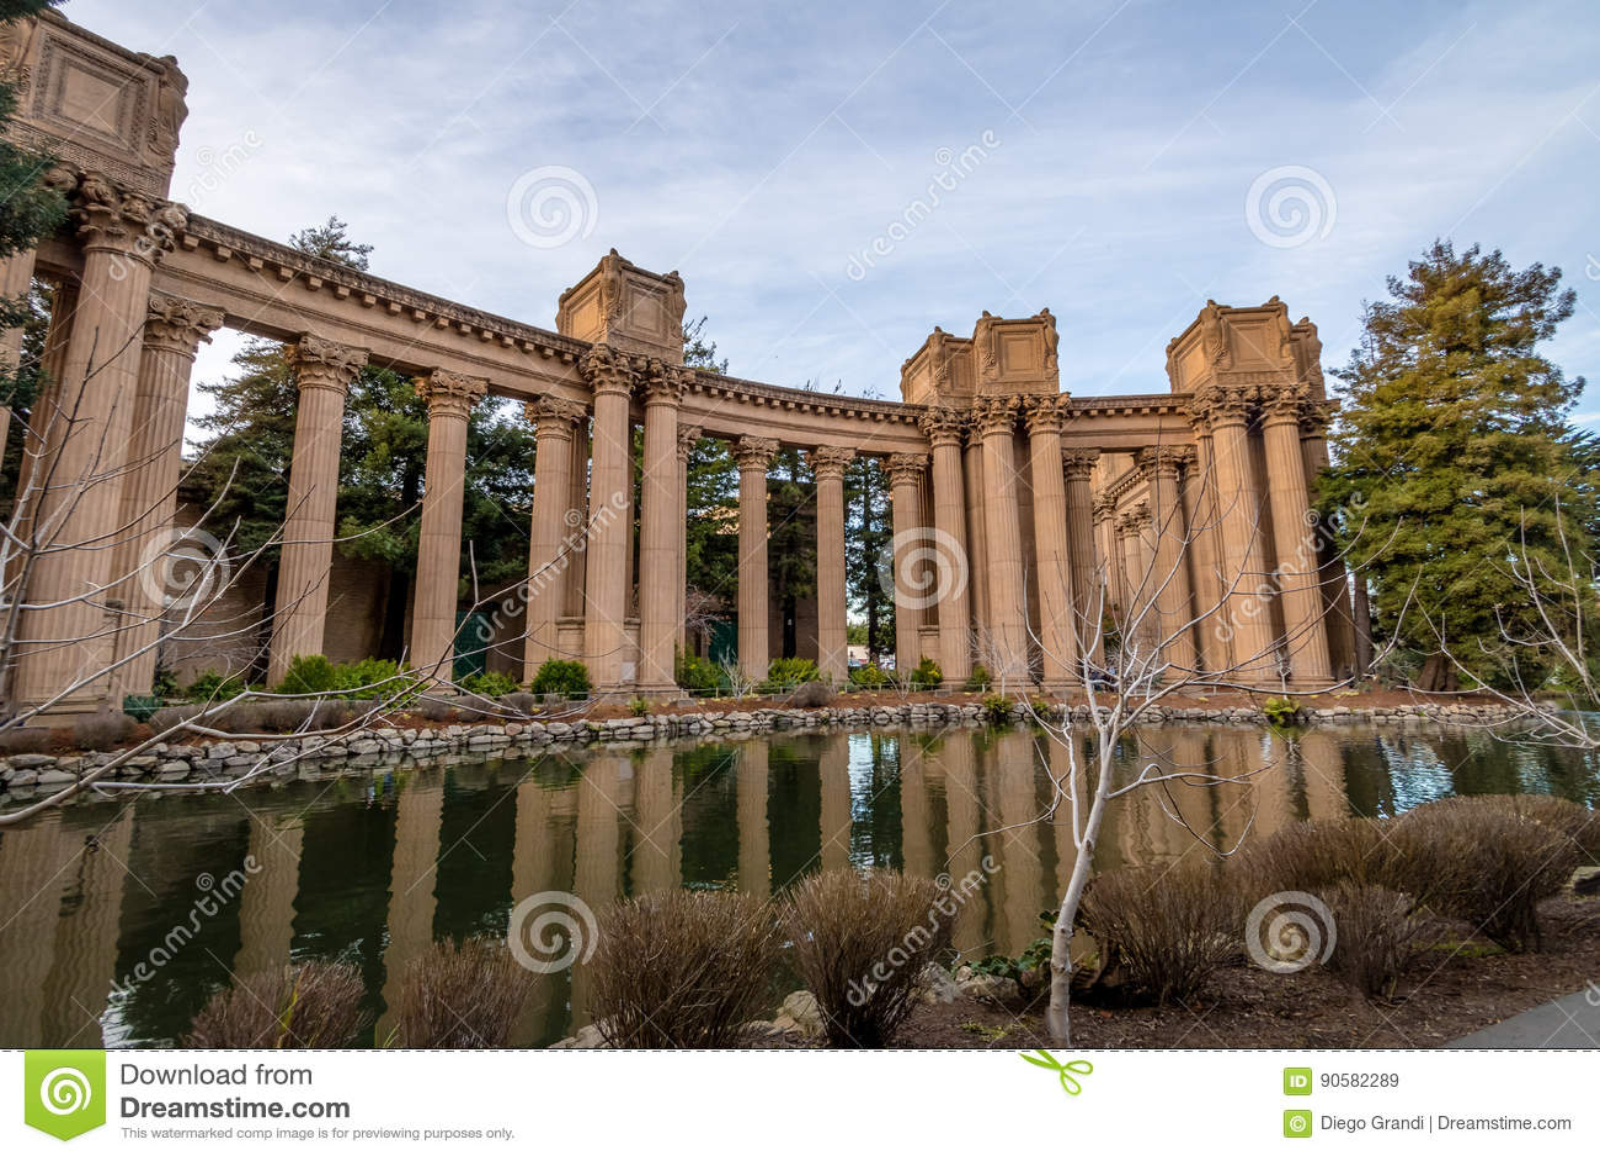 Columns Of The Palace Of Fine Arts San Francisco California Usa